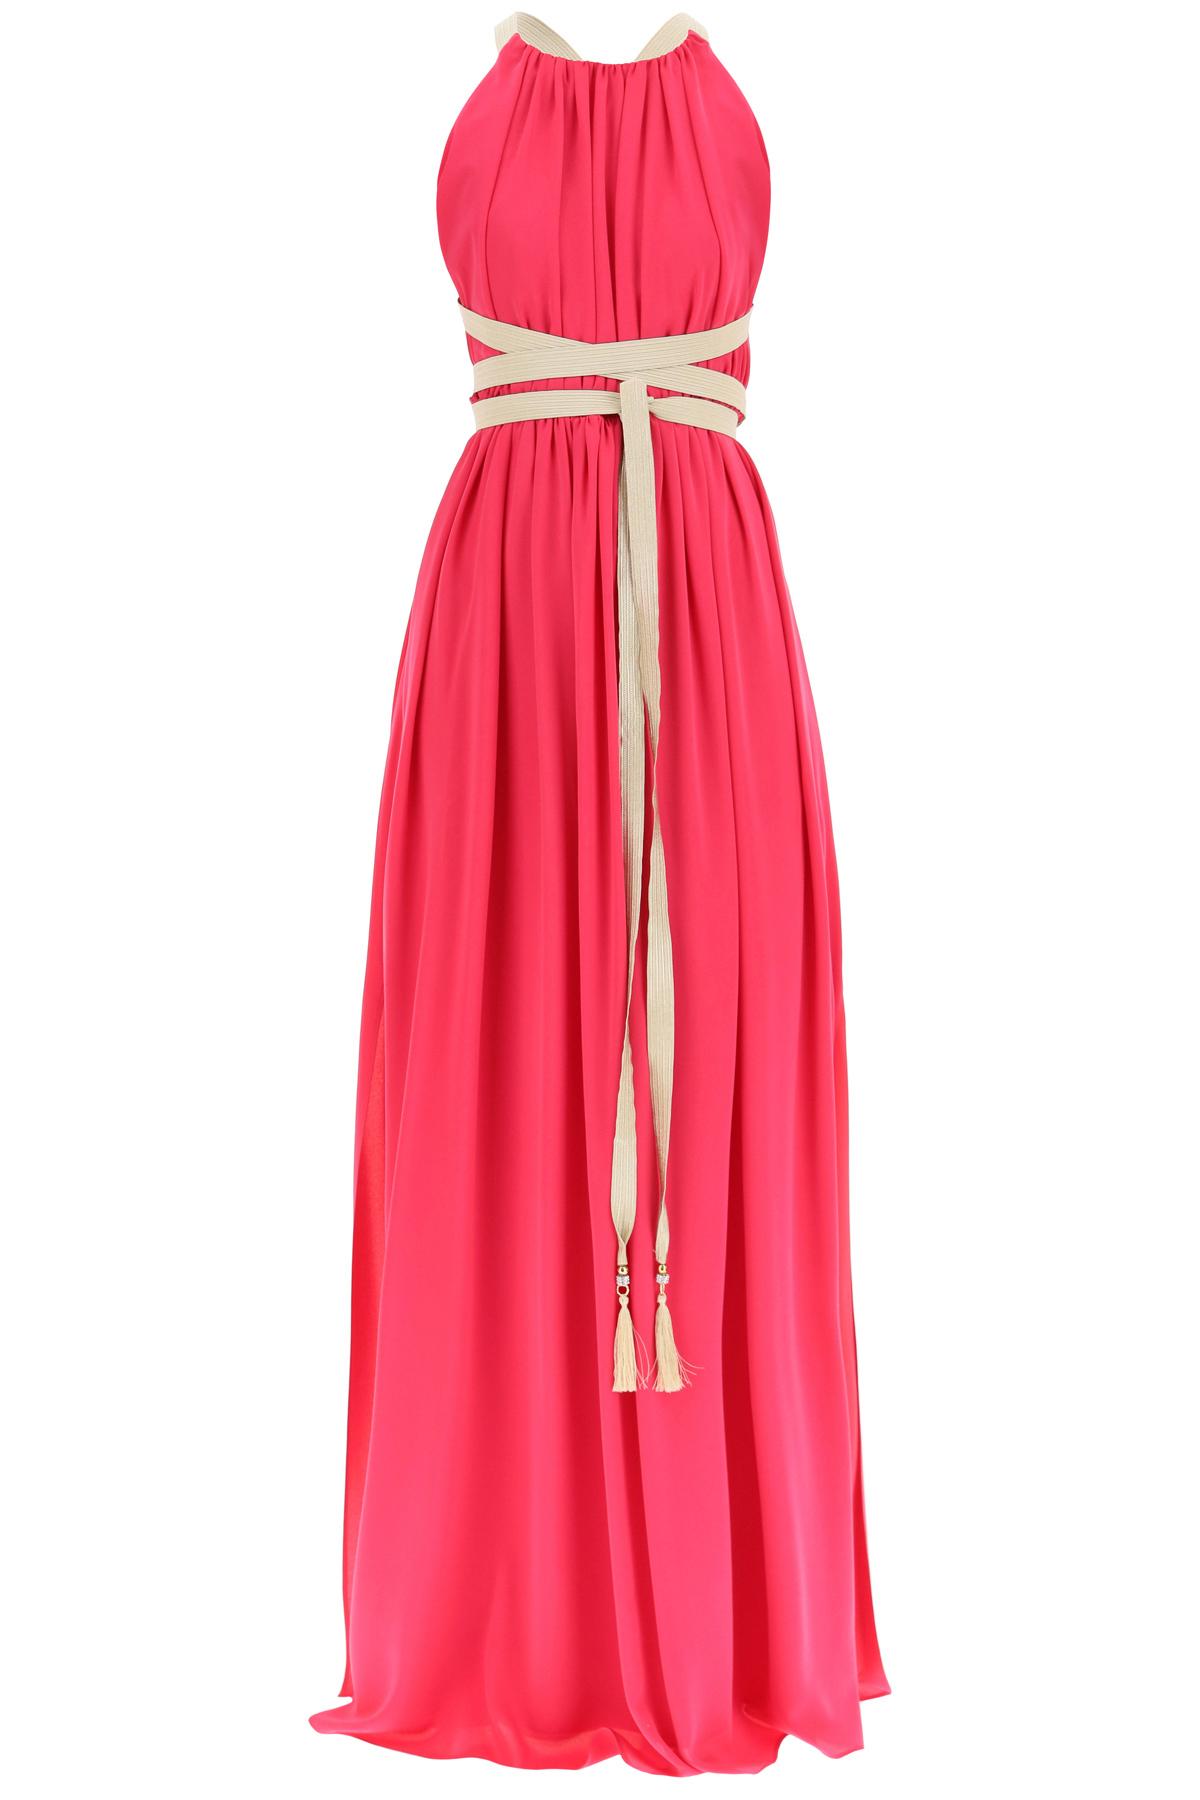 MAX MARA LONG SILK DRESS 40 Fuchsia, Gold Silk